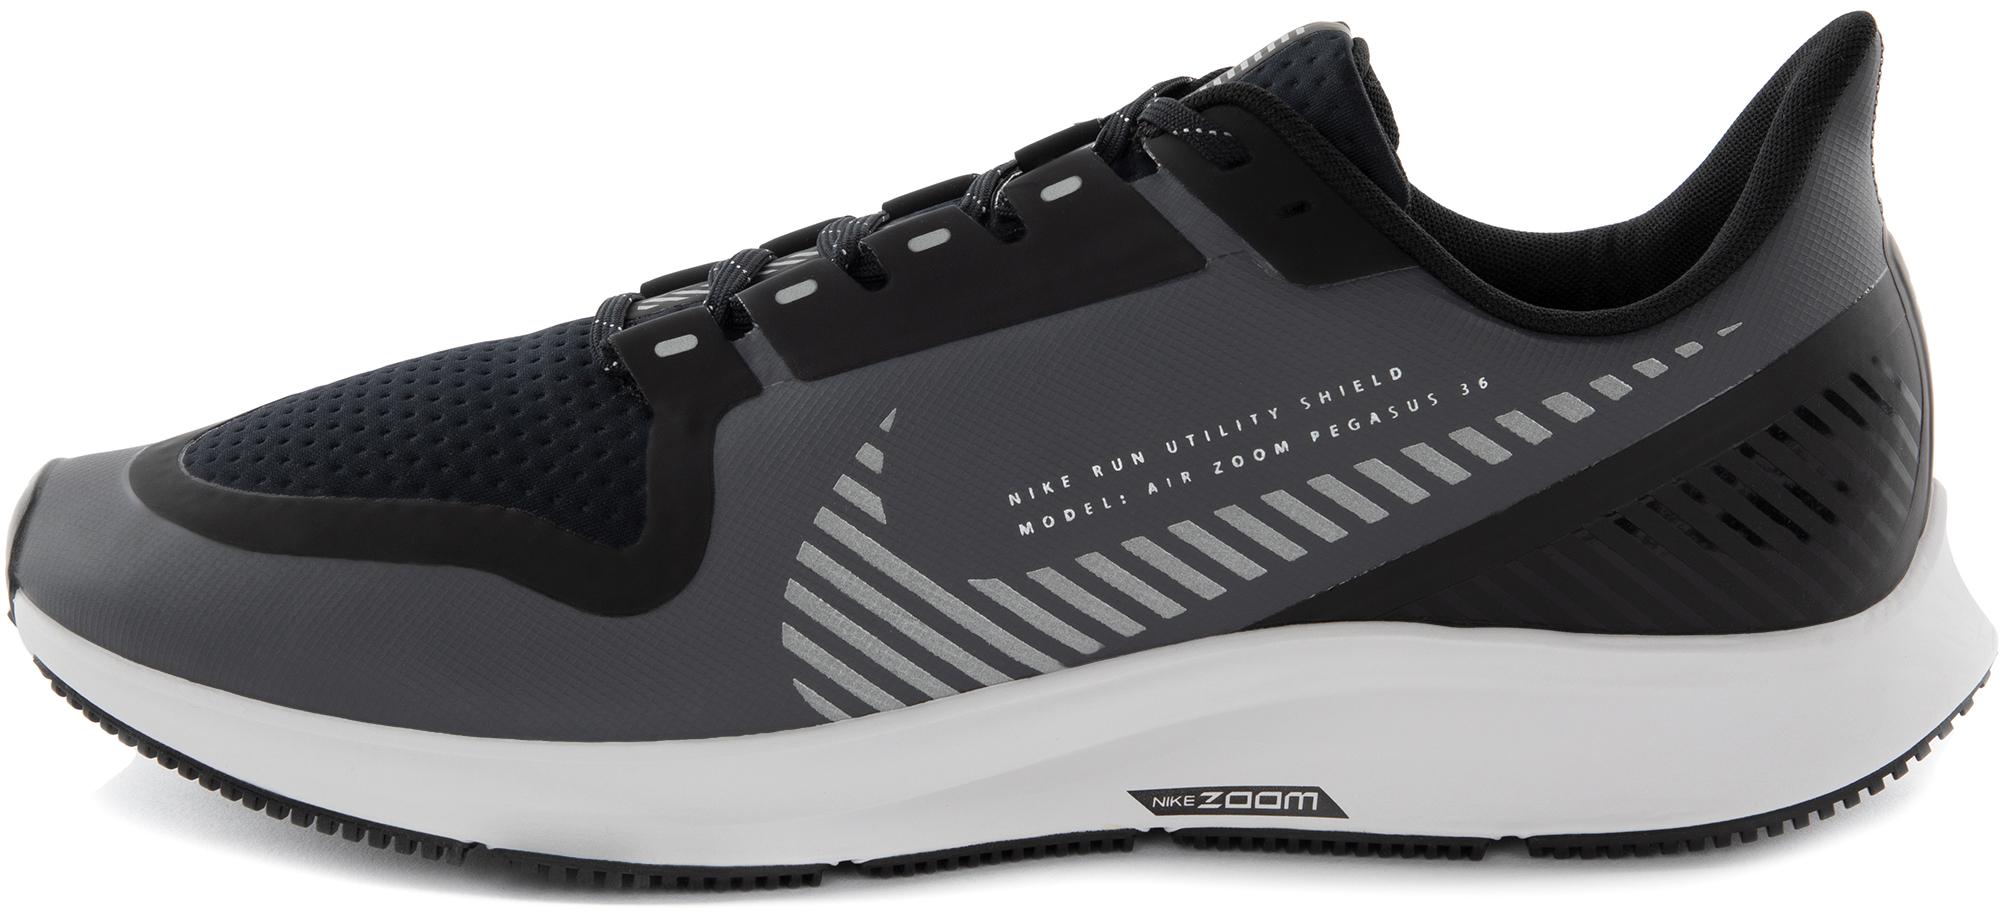 Nike Кроссовки мужские Nike Zoom Pegasus 36 Shield, размер 45 цена